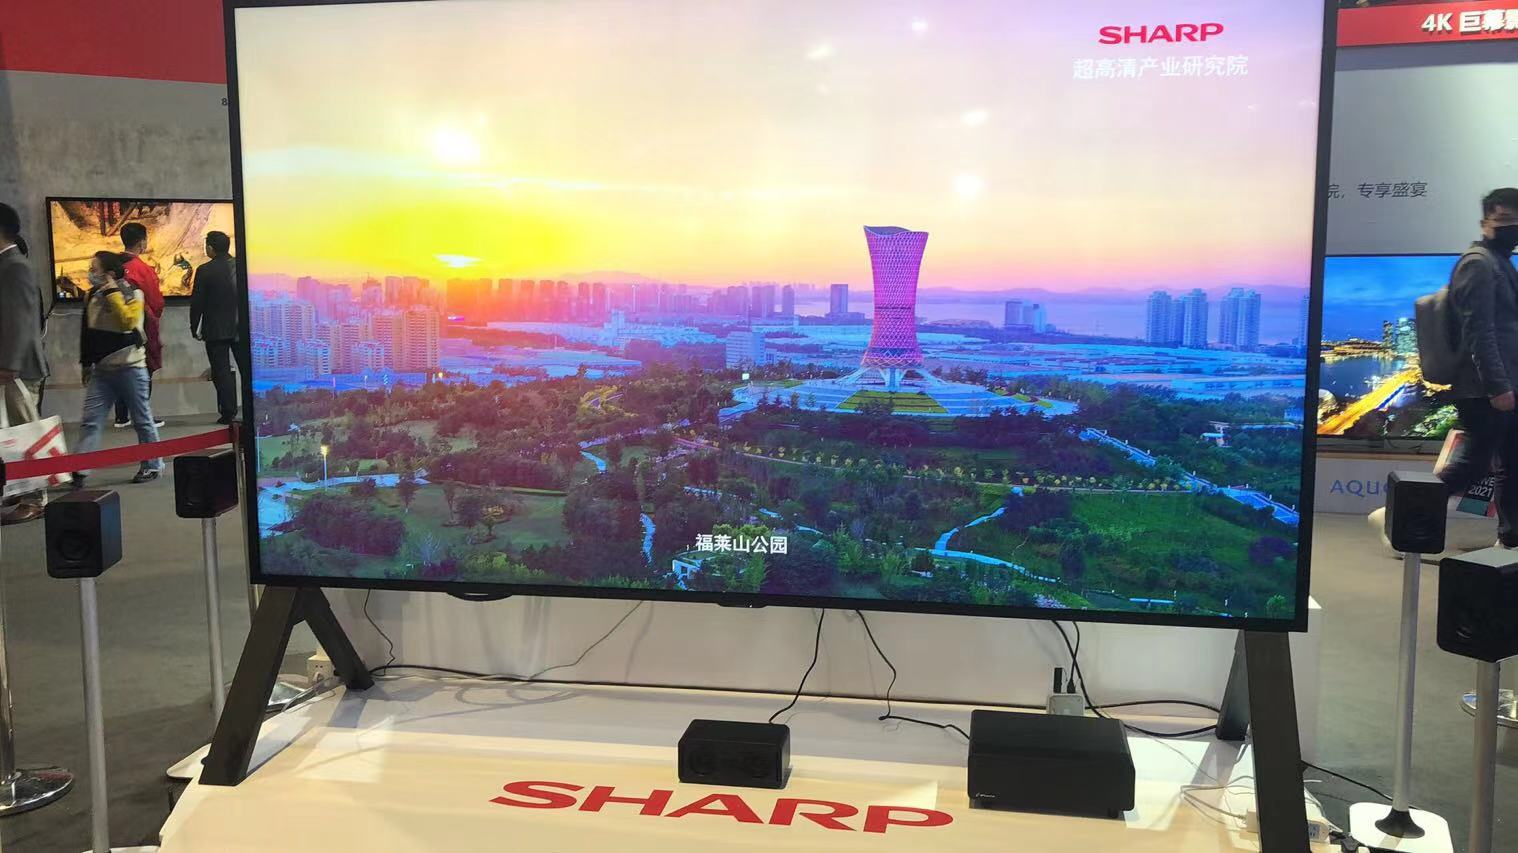 WiSA會員富士康在AWE博覽會上展示配有WiSA SoundSend和無線音箱系統的夏普120英寸8K電視